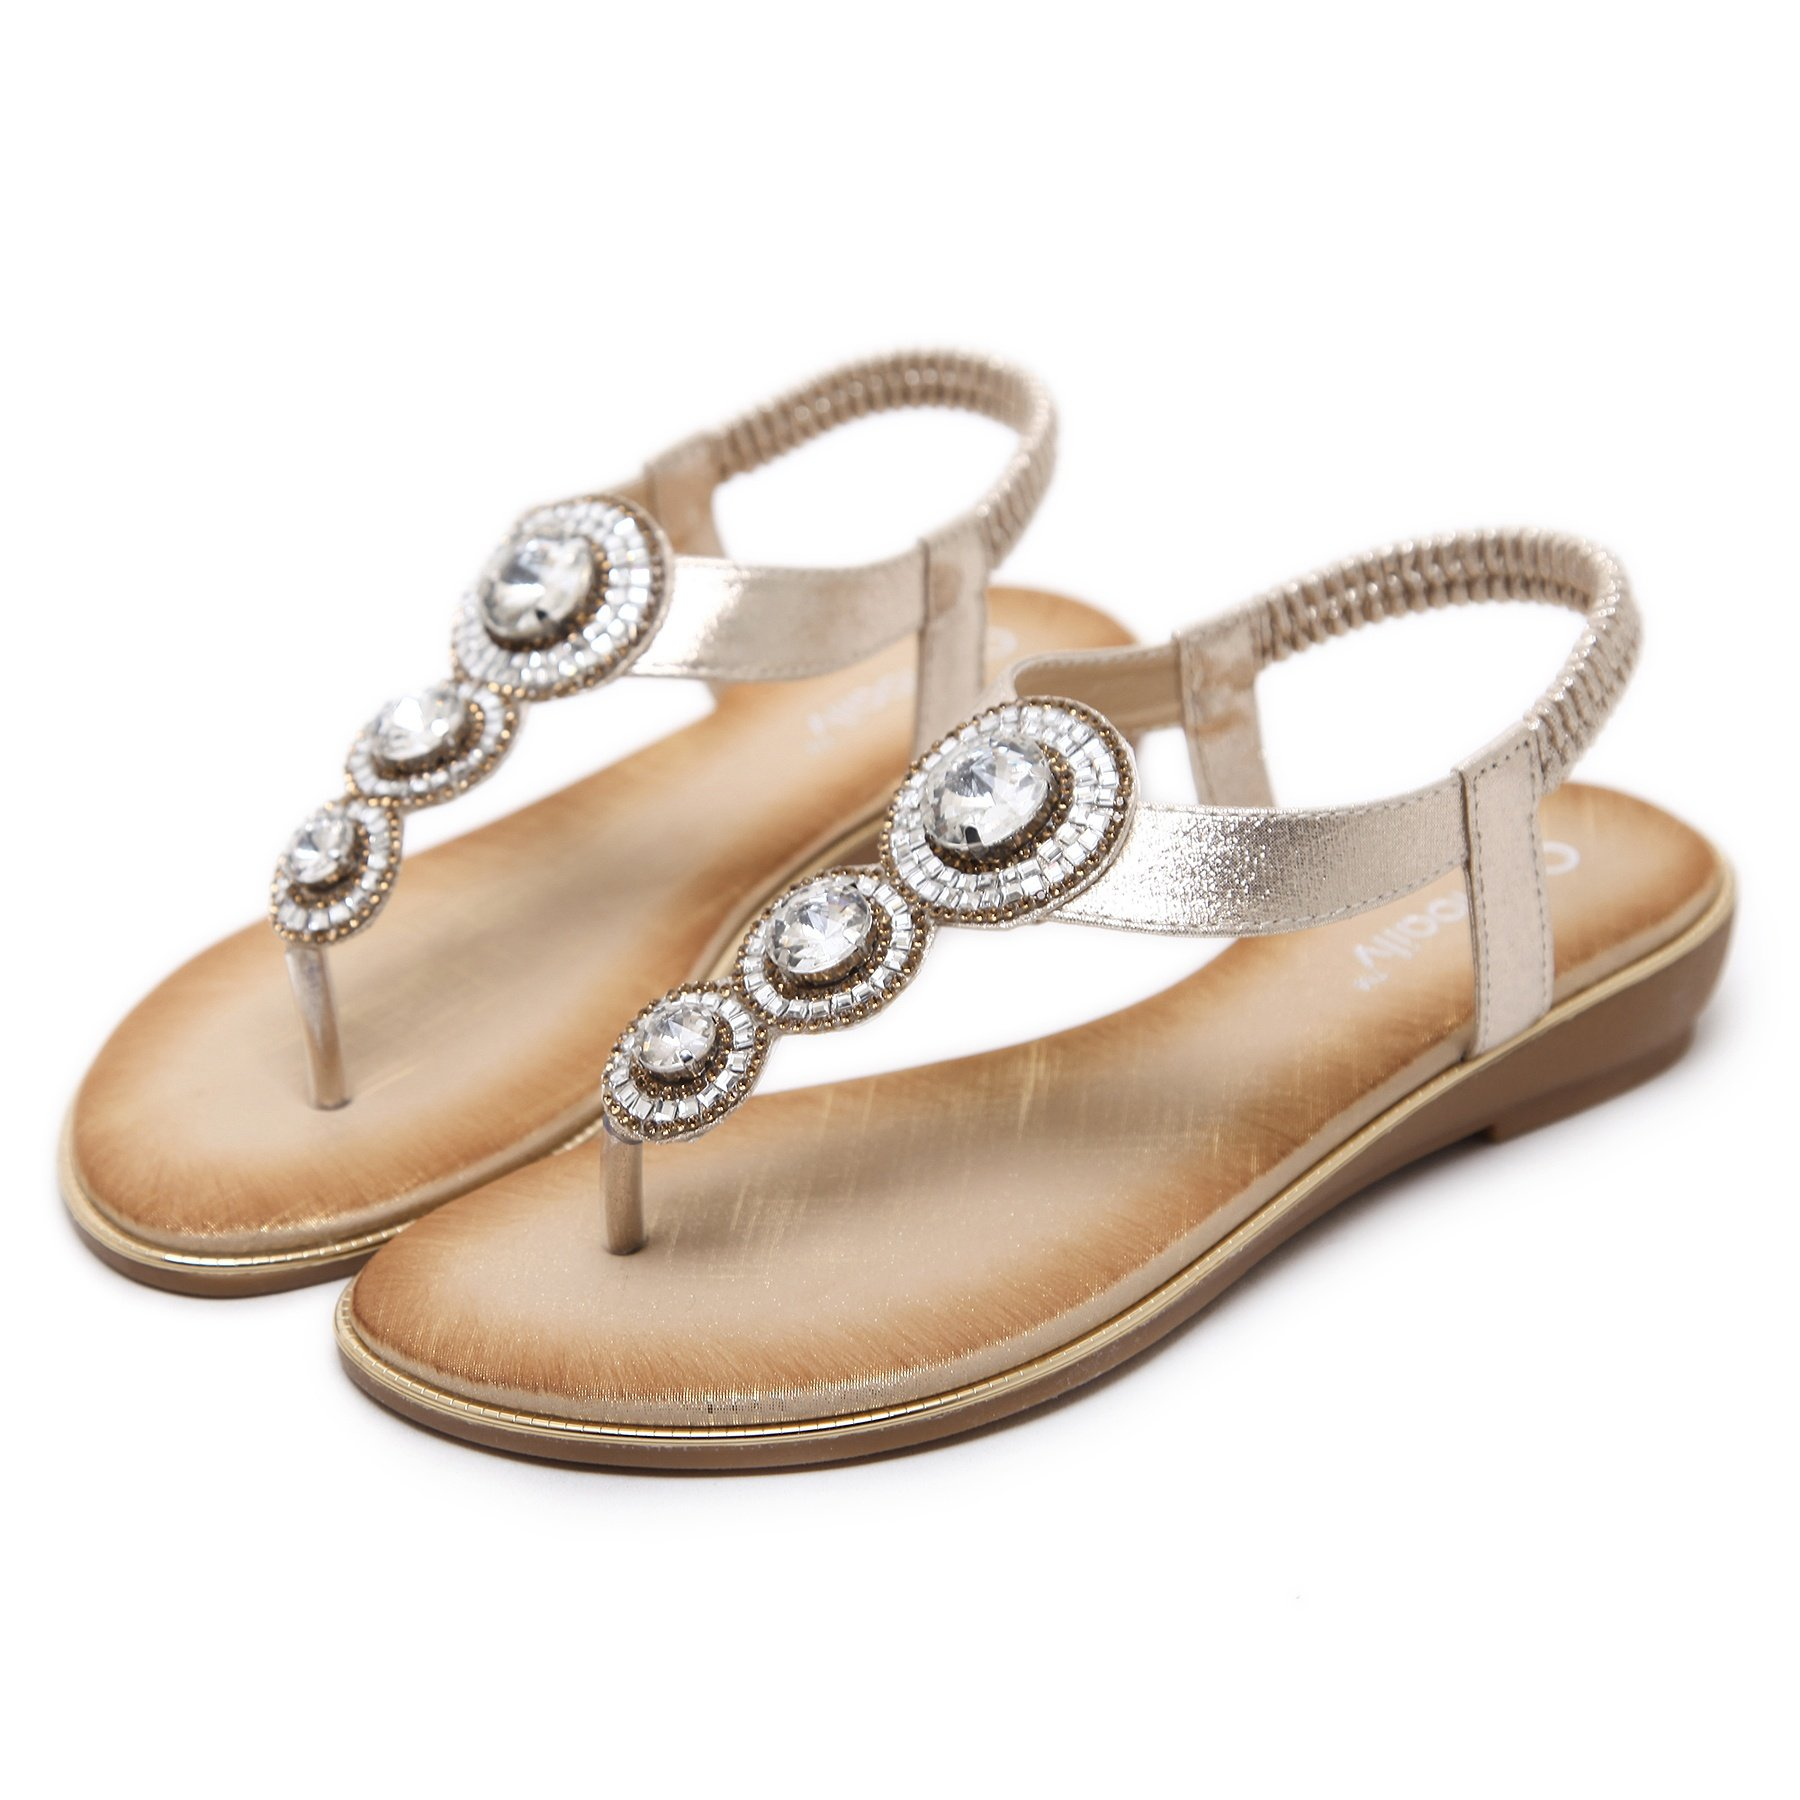 Meeshine Womens Flat Sandals Summer Rhinestone Comfort Bohemian Flip Flop Shoes Gold-02 US 8.5 by Meeshine (Image #3)